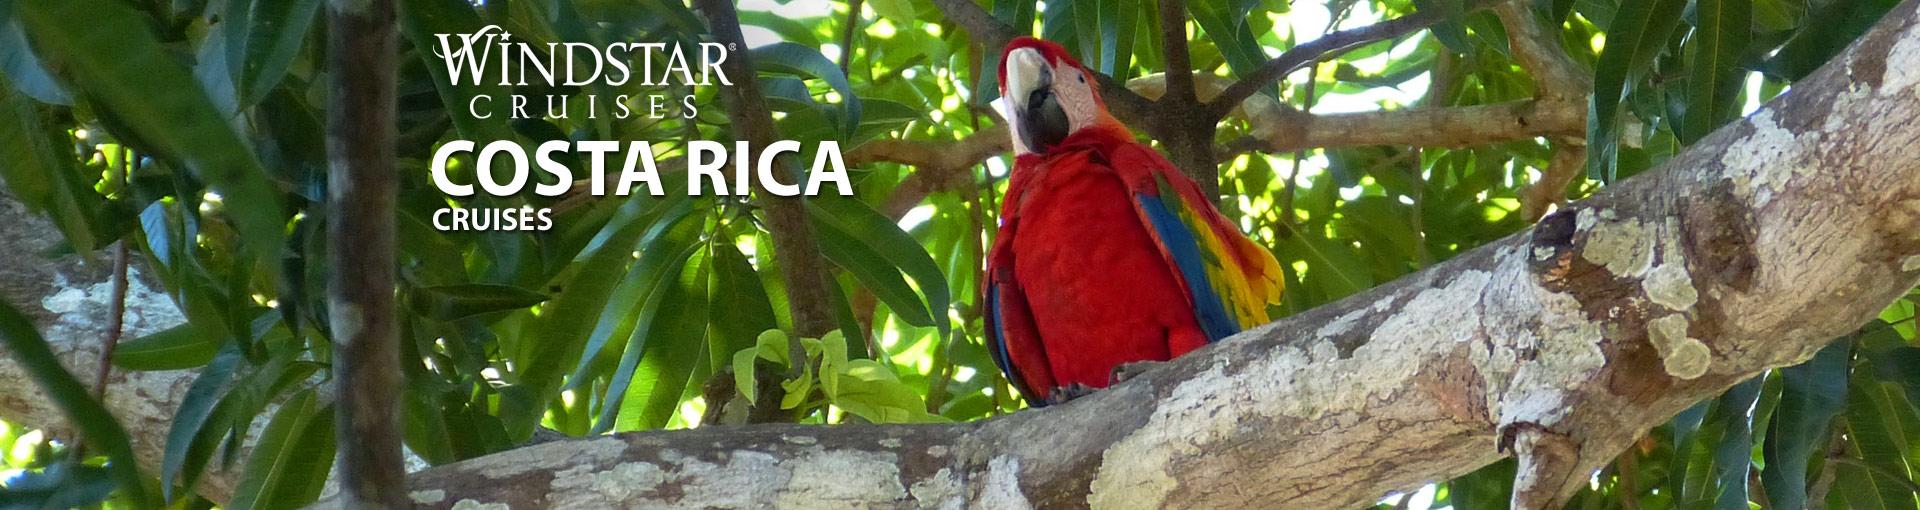 Windstar Cruises Costa Rica